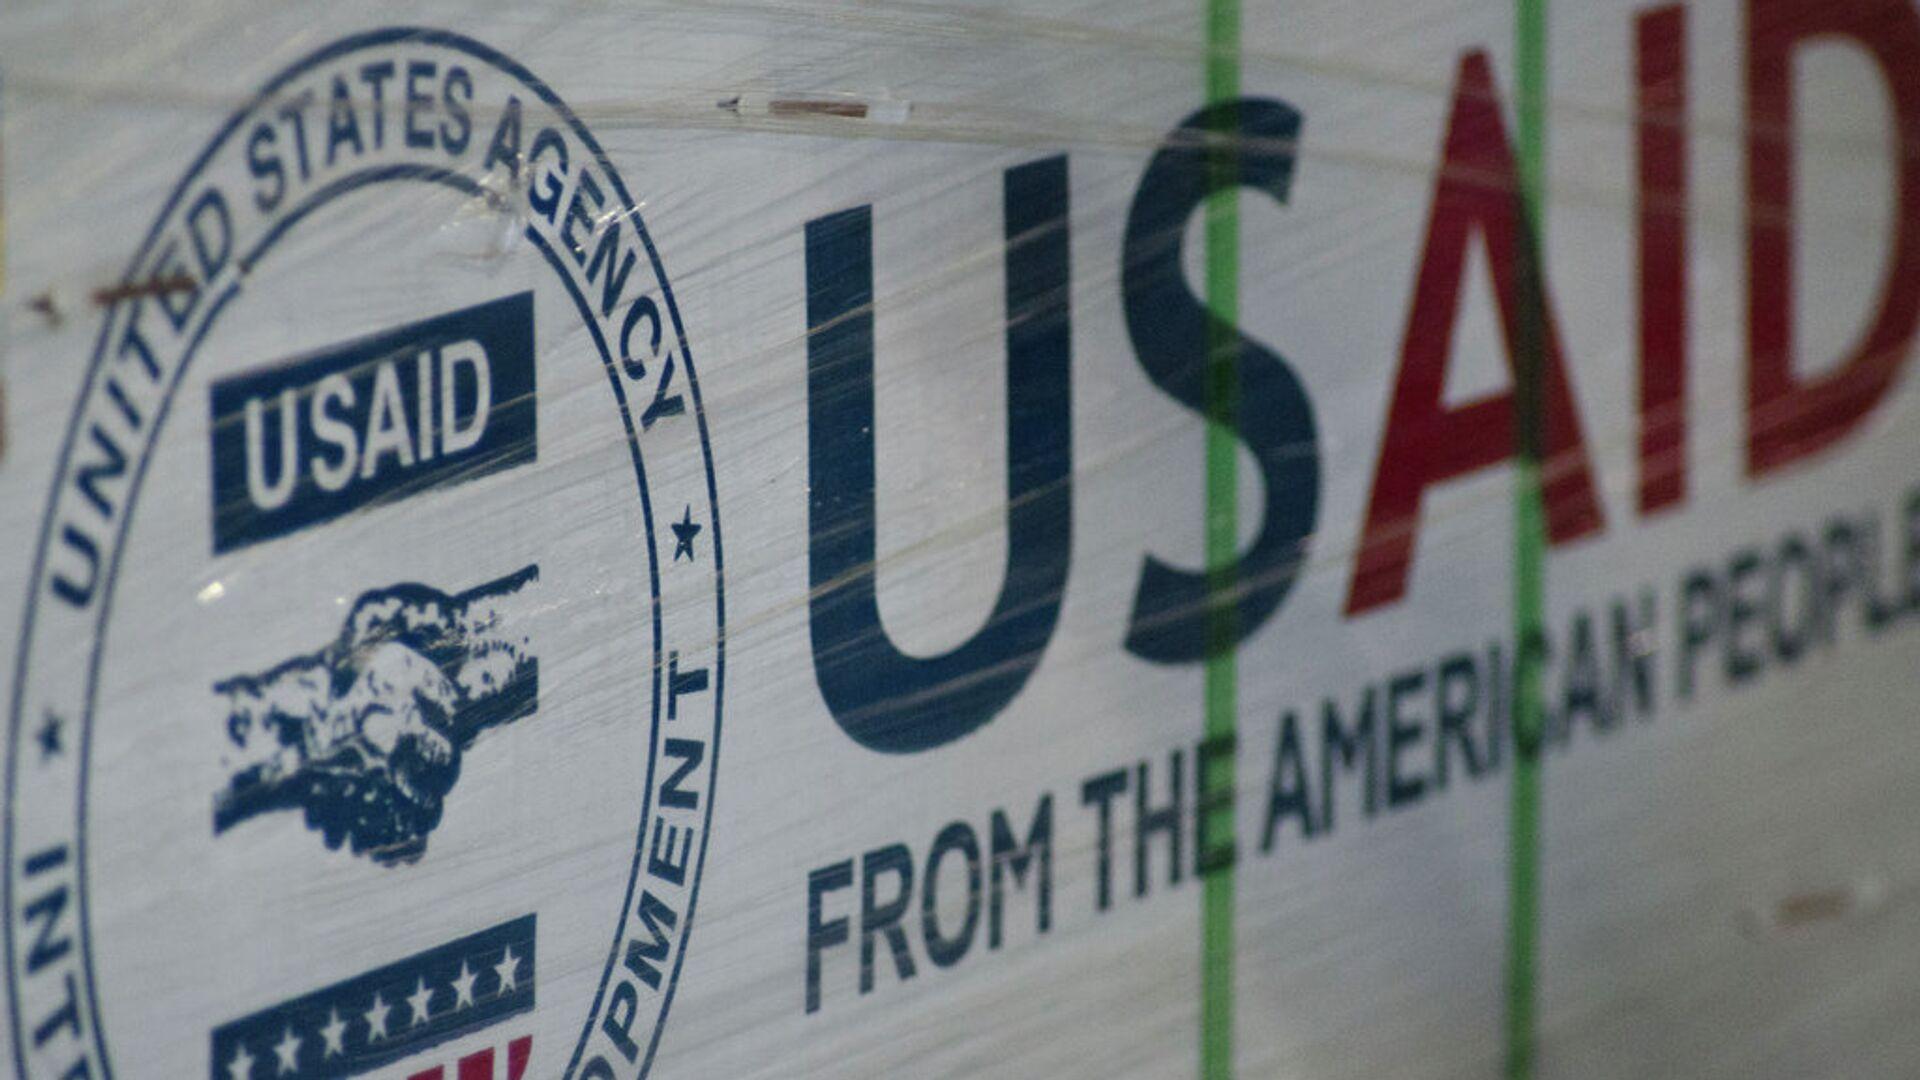 Помощь от агентства США по международному развитию (USAID) - РИА Новости, 1920, 19.09.2012